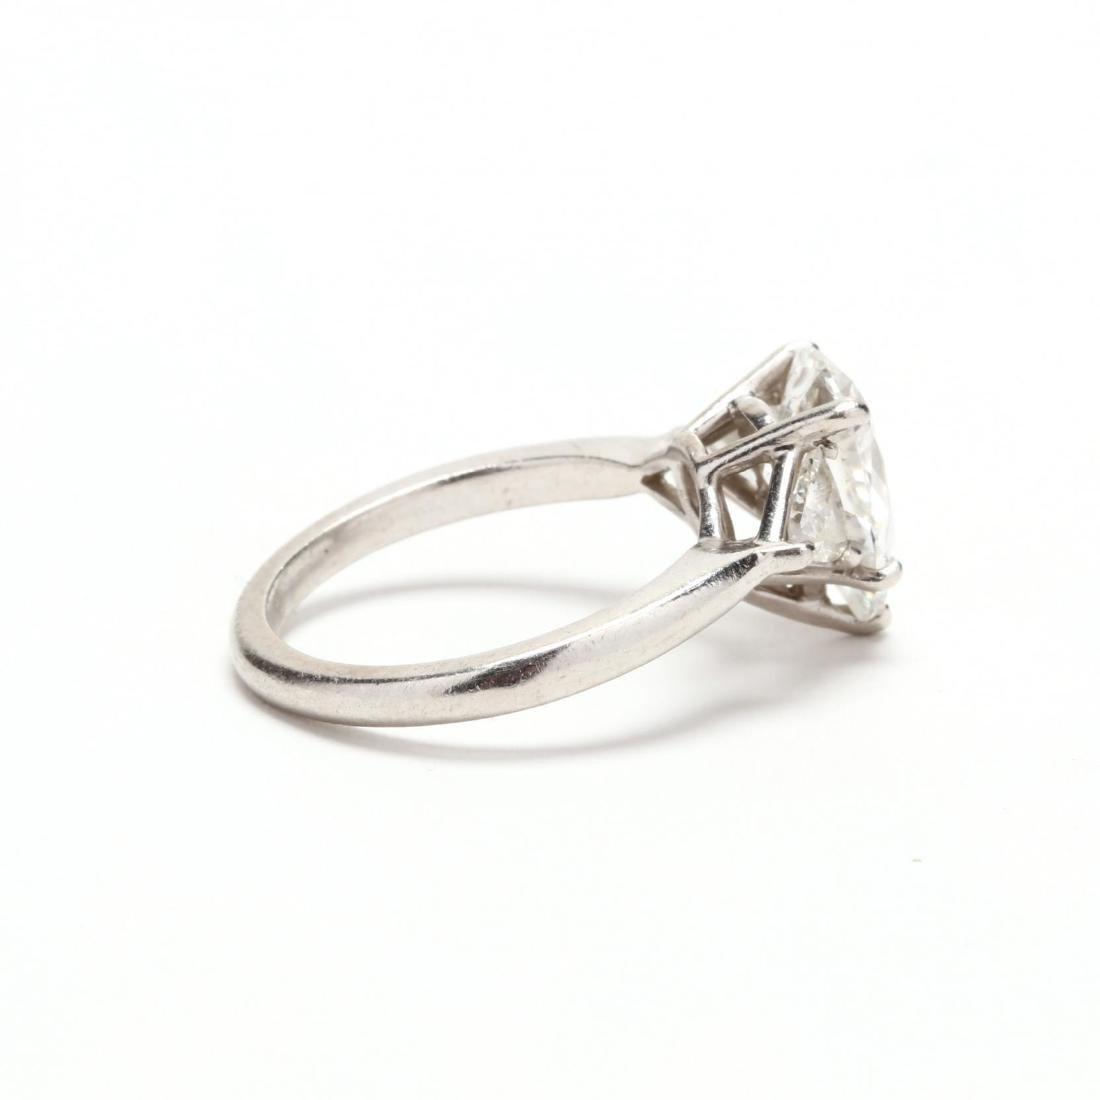 Unmounted Diamond with Platinum and Diamond Mount - 2